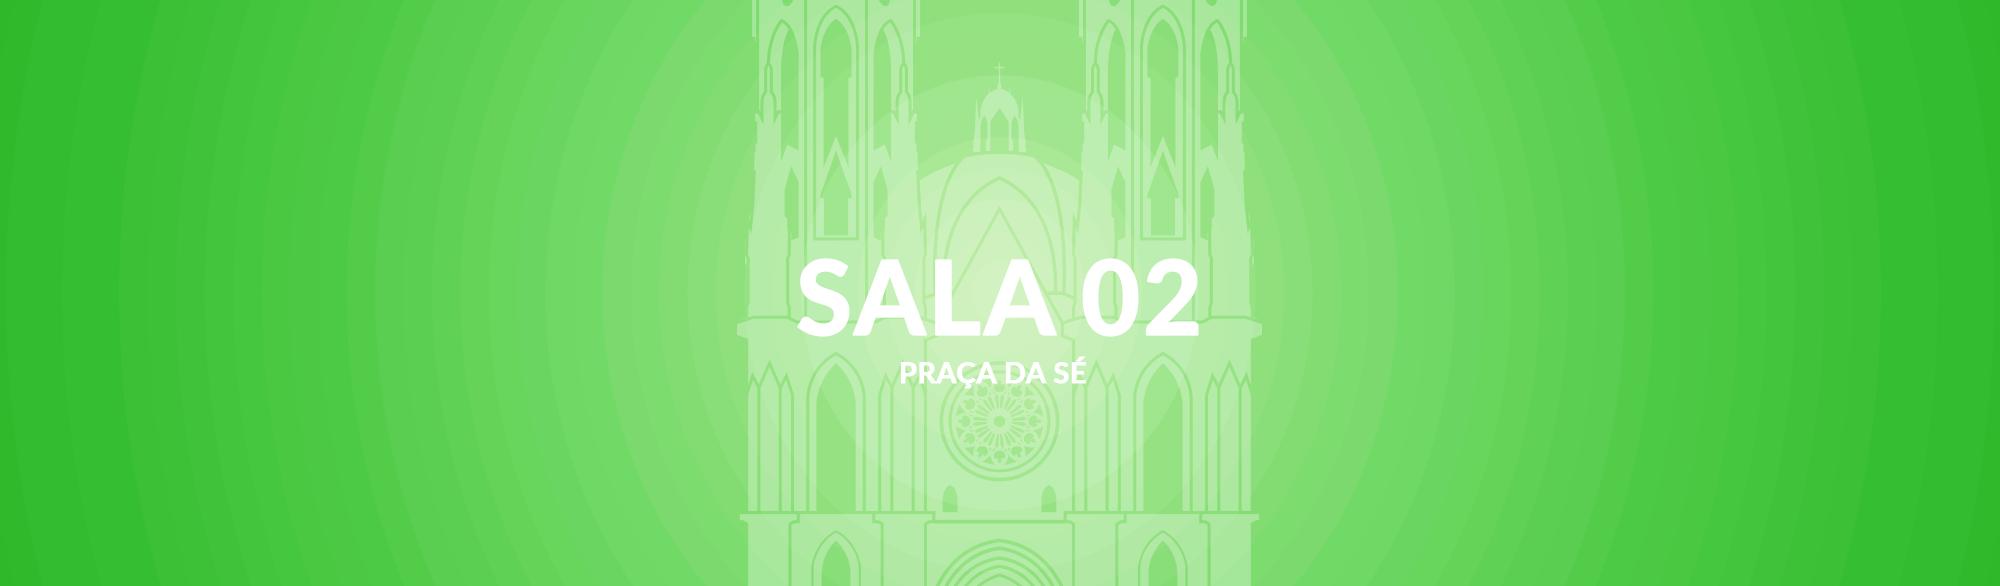 Banner dia03 sala02